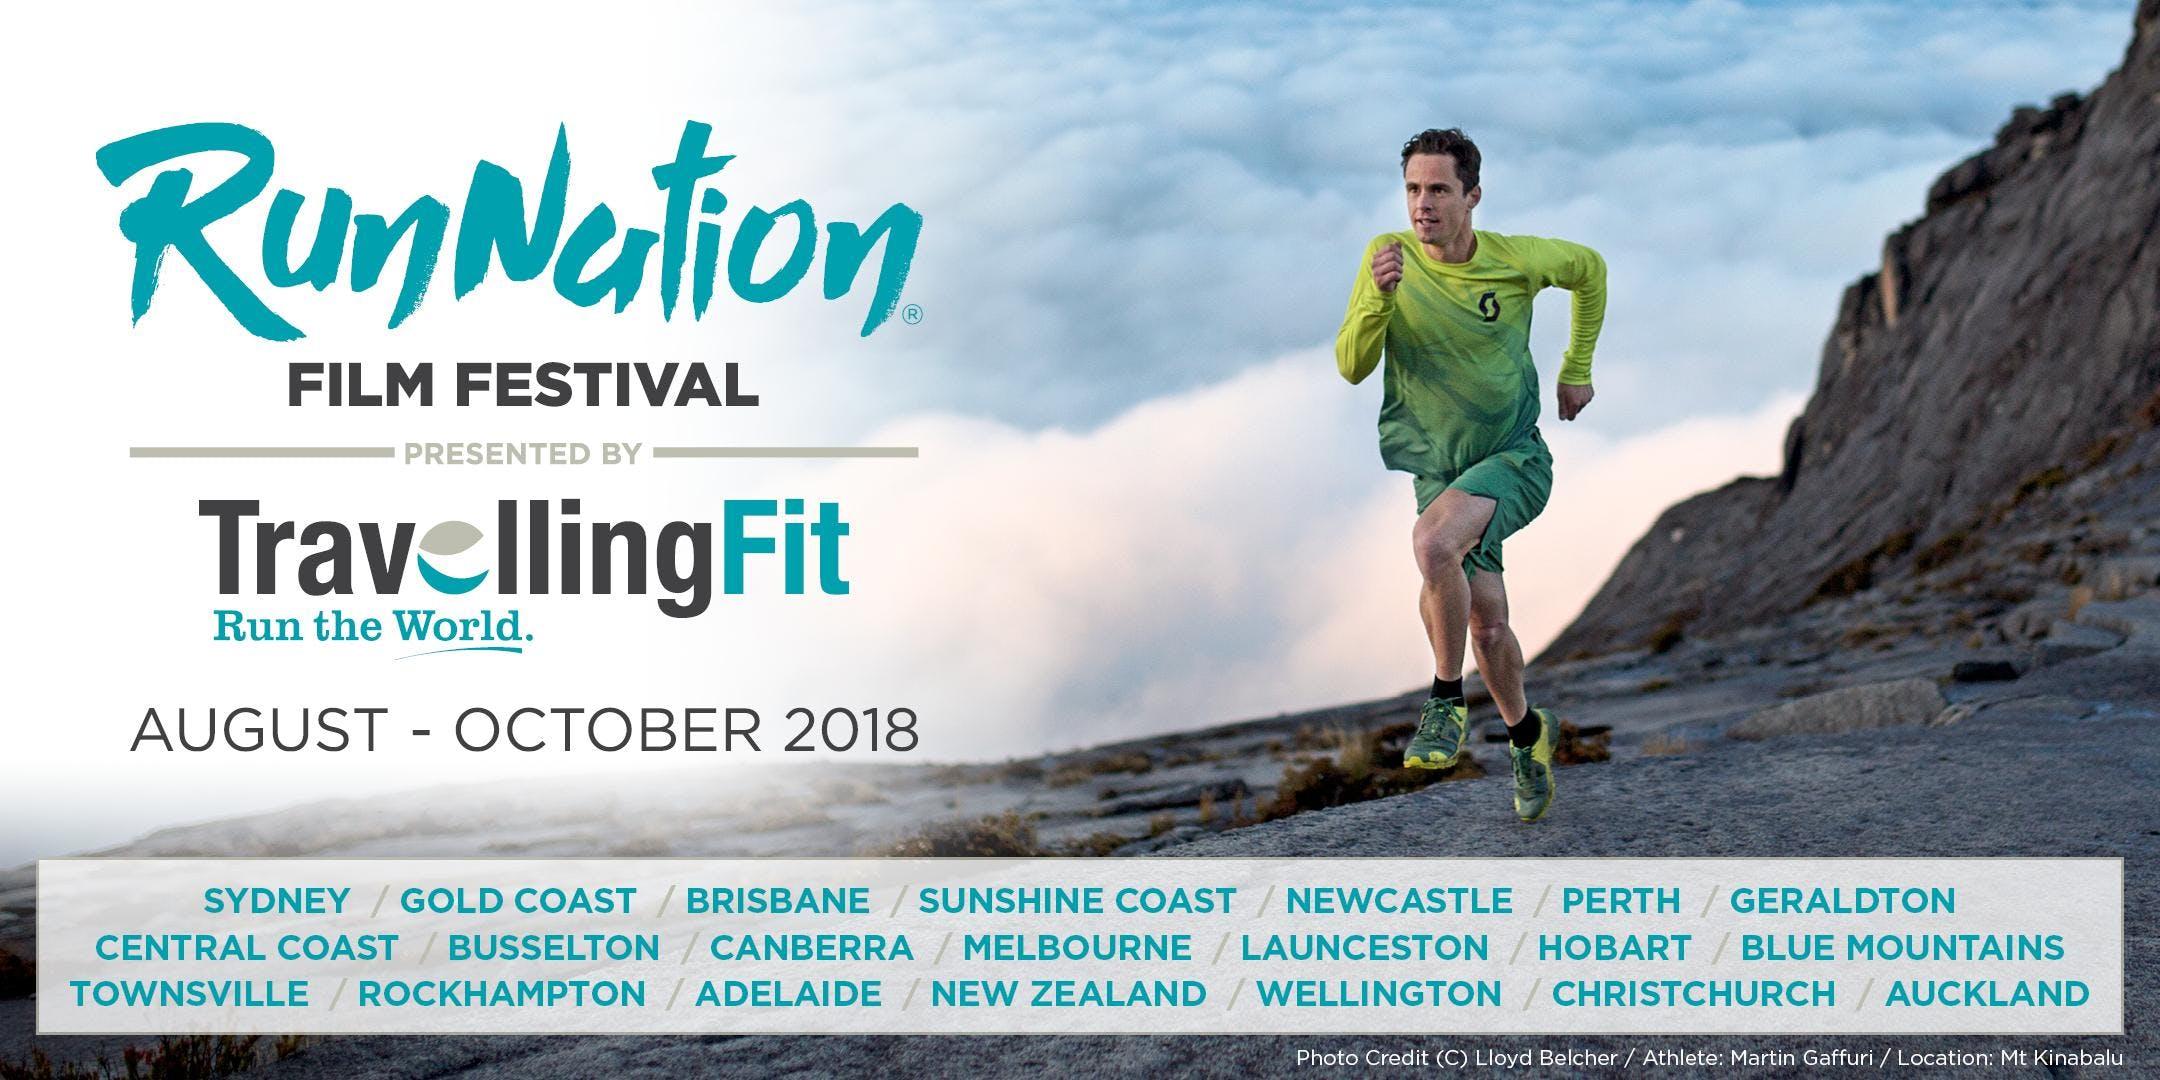 Run Nation Film Festival 2018 presented by Tr